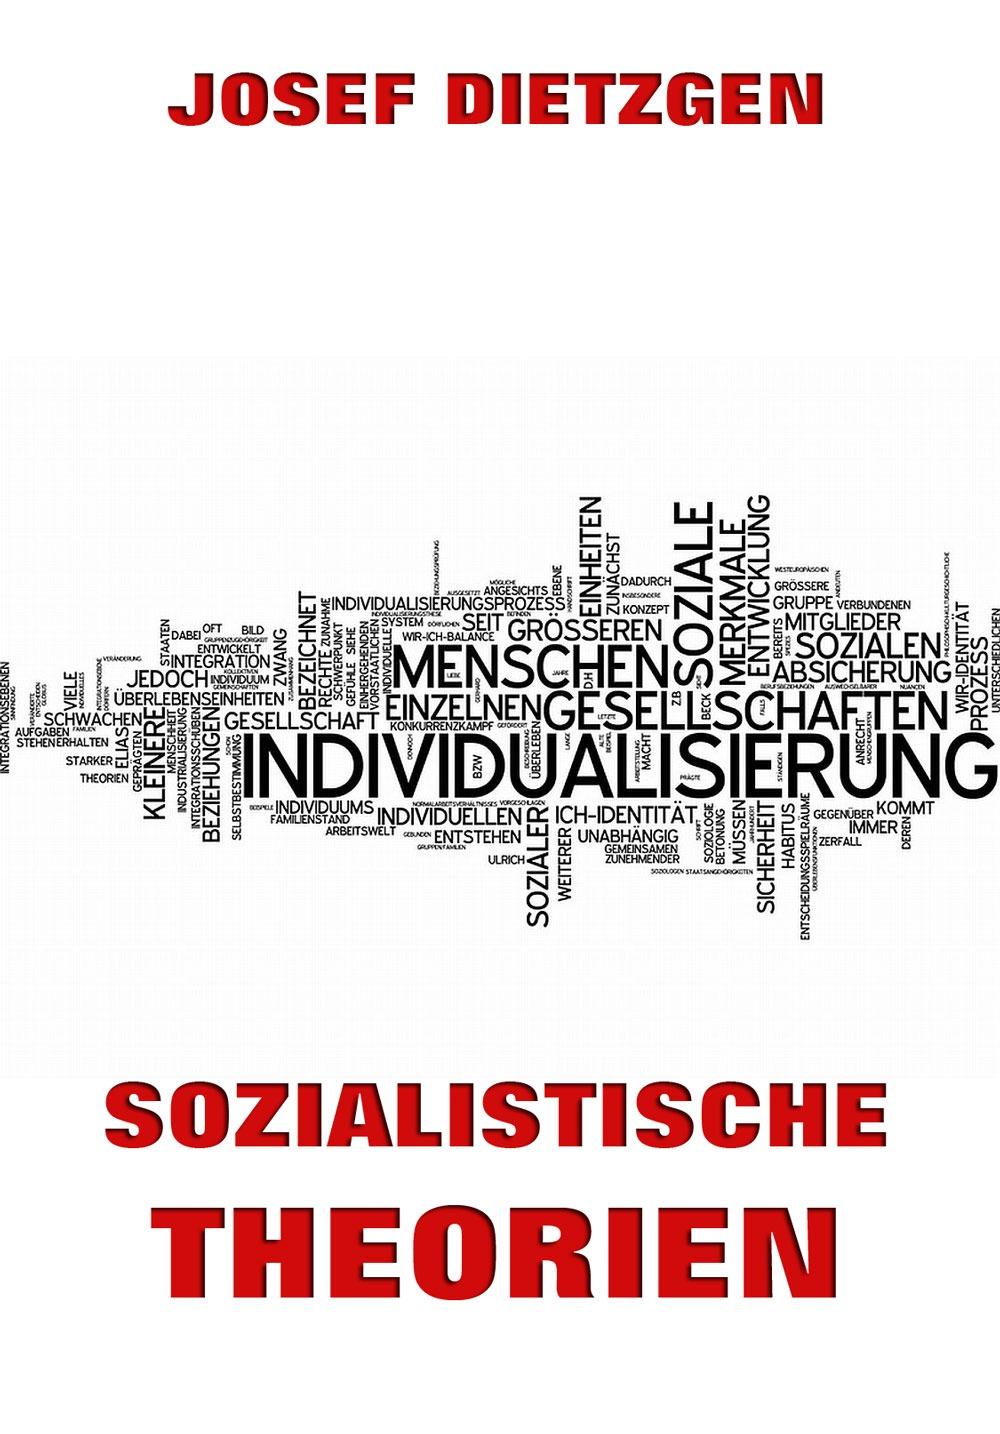 Josef Dietzgen Sozialistische Theorien